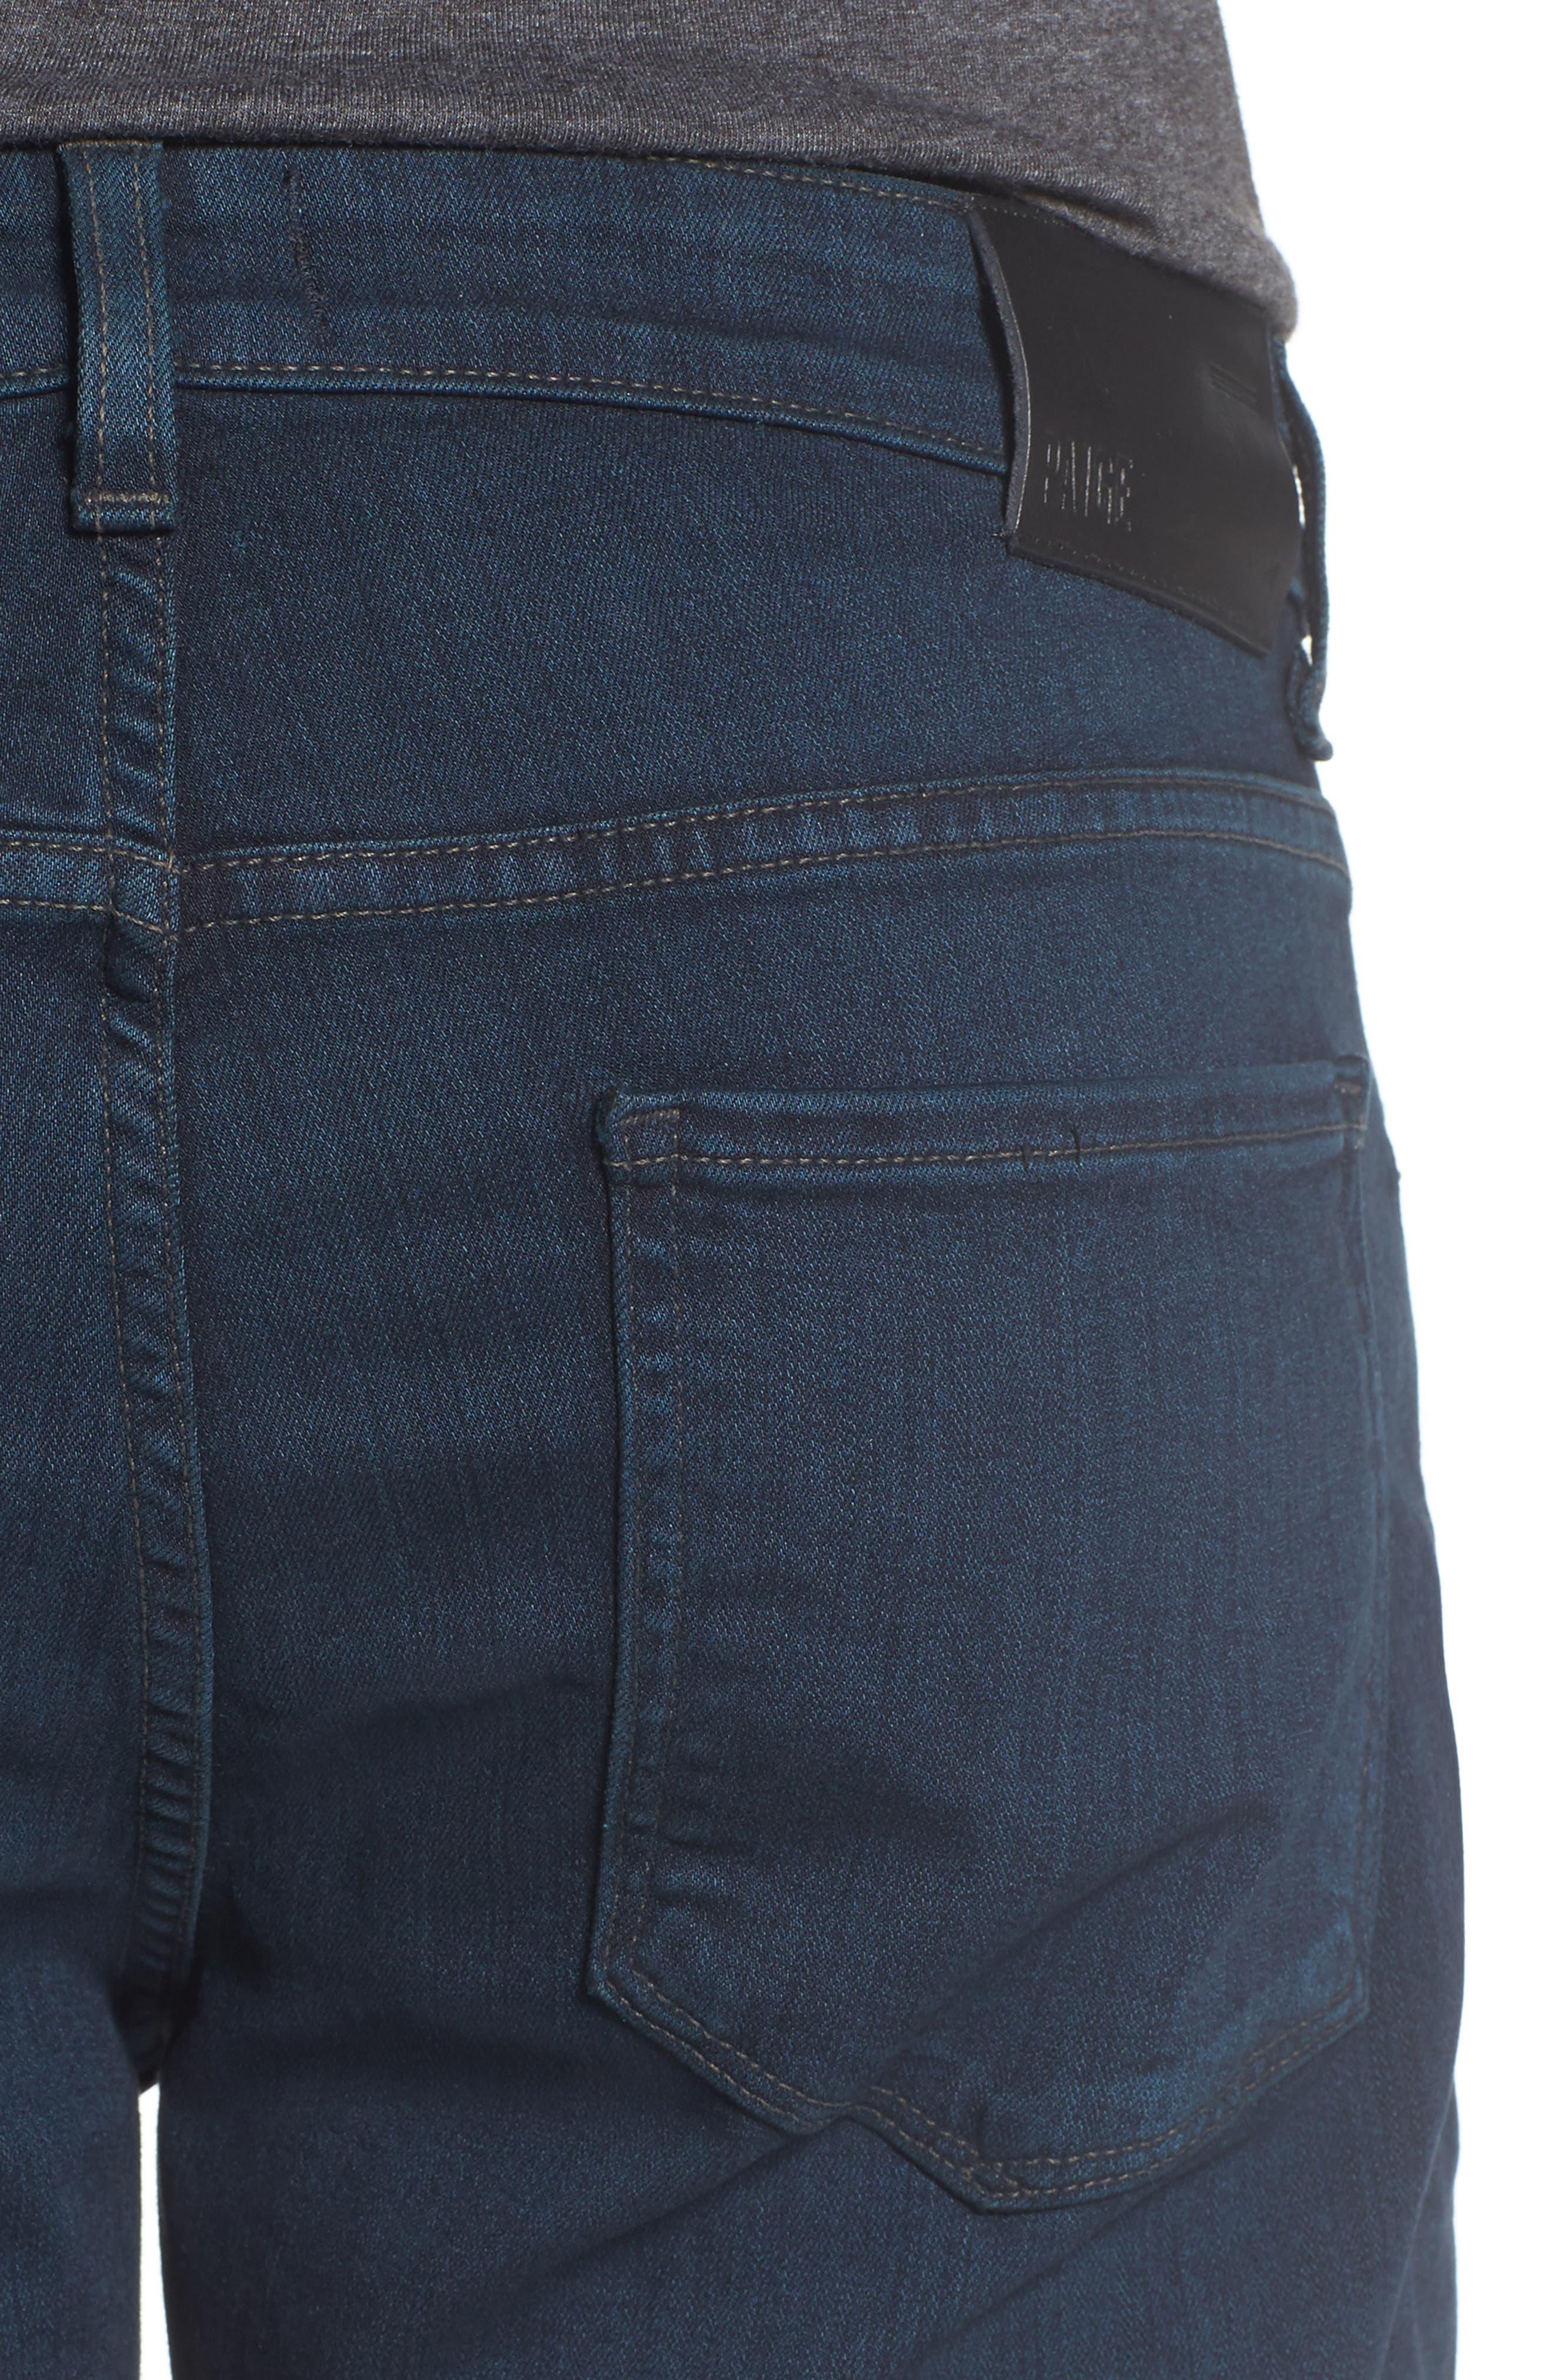 Transcend - Federal Slim Straight Leg Jeans,                             Alternate thumbnail 4, color,                             ARLO